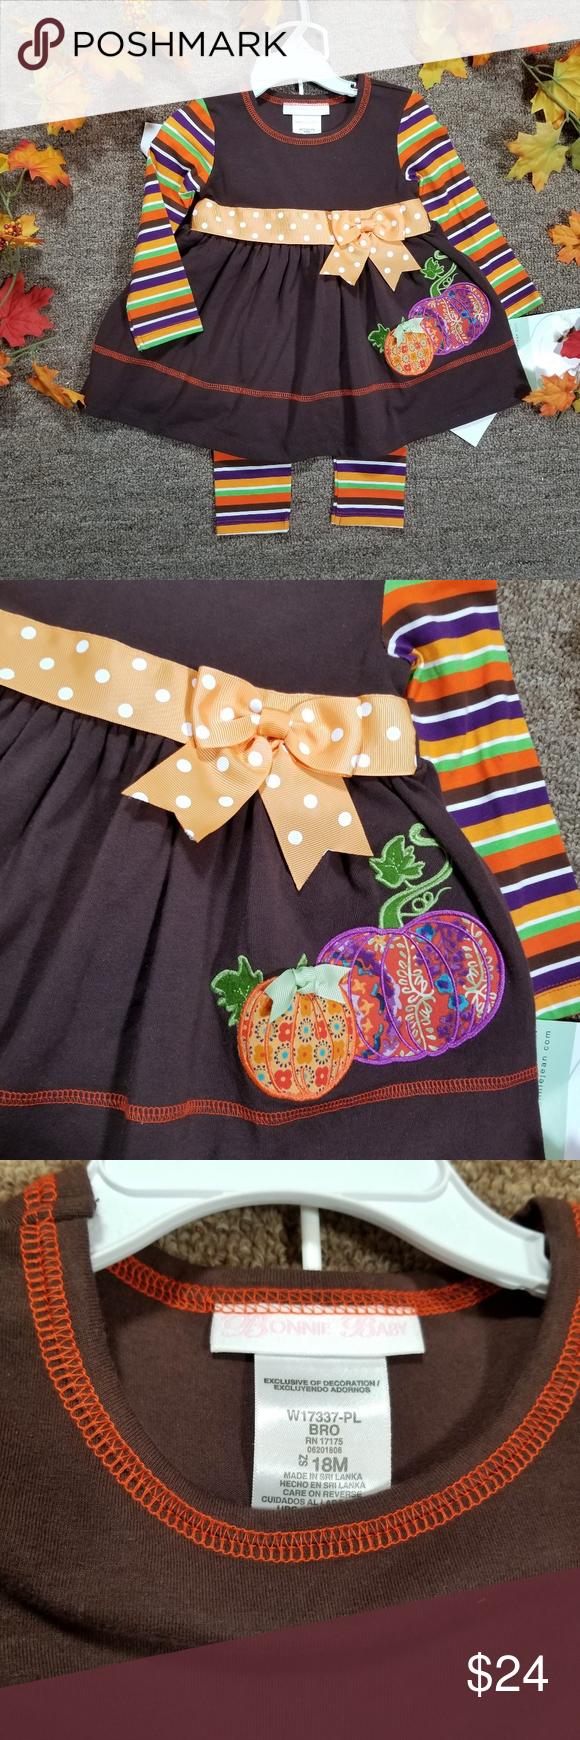 Bonnie Jean Baby Girls Brown Orange Stripe Polka Dot Belted Dress 18M